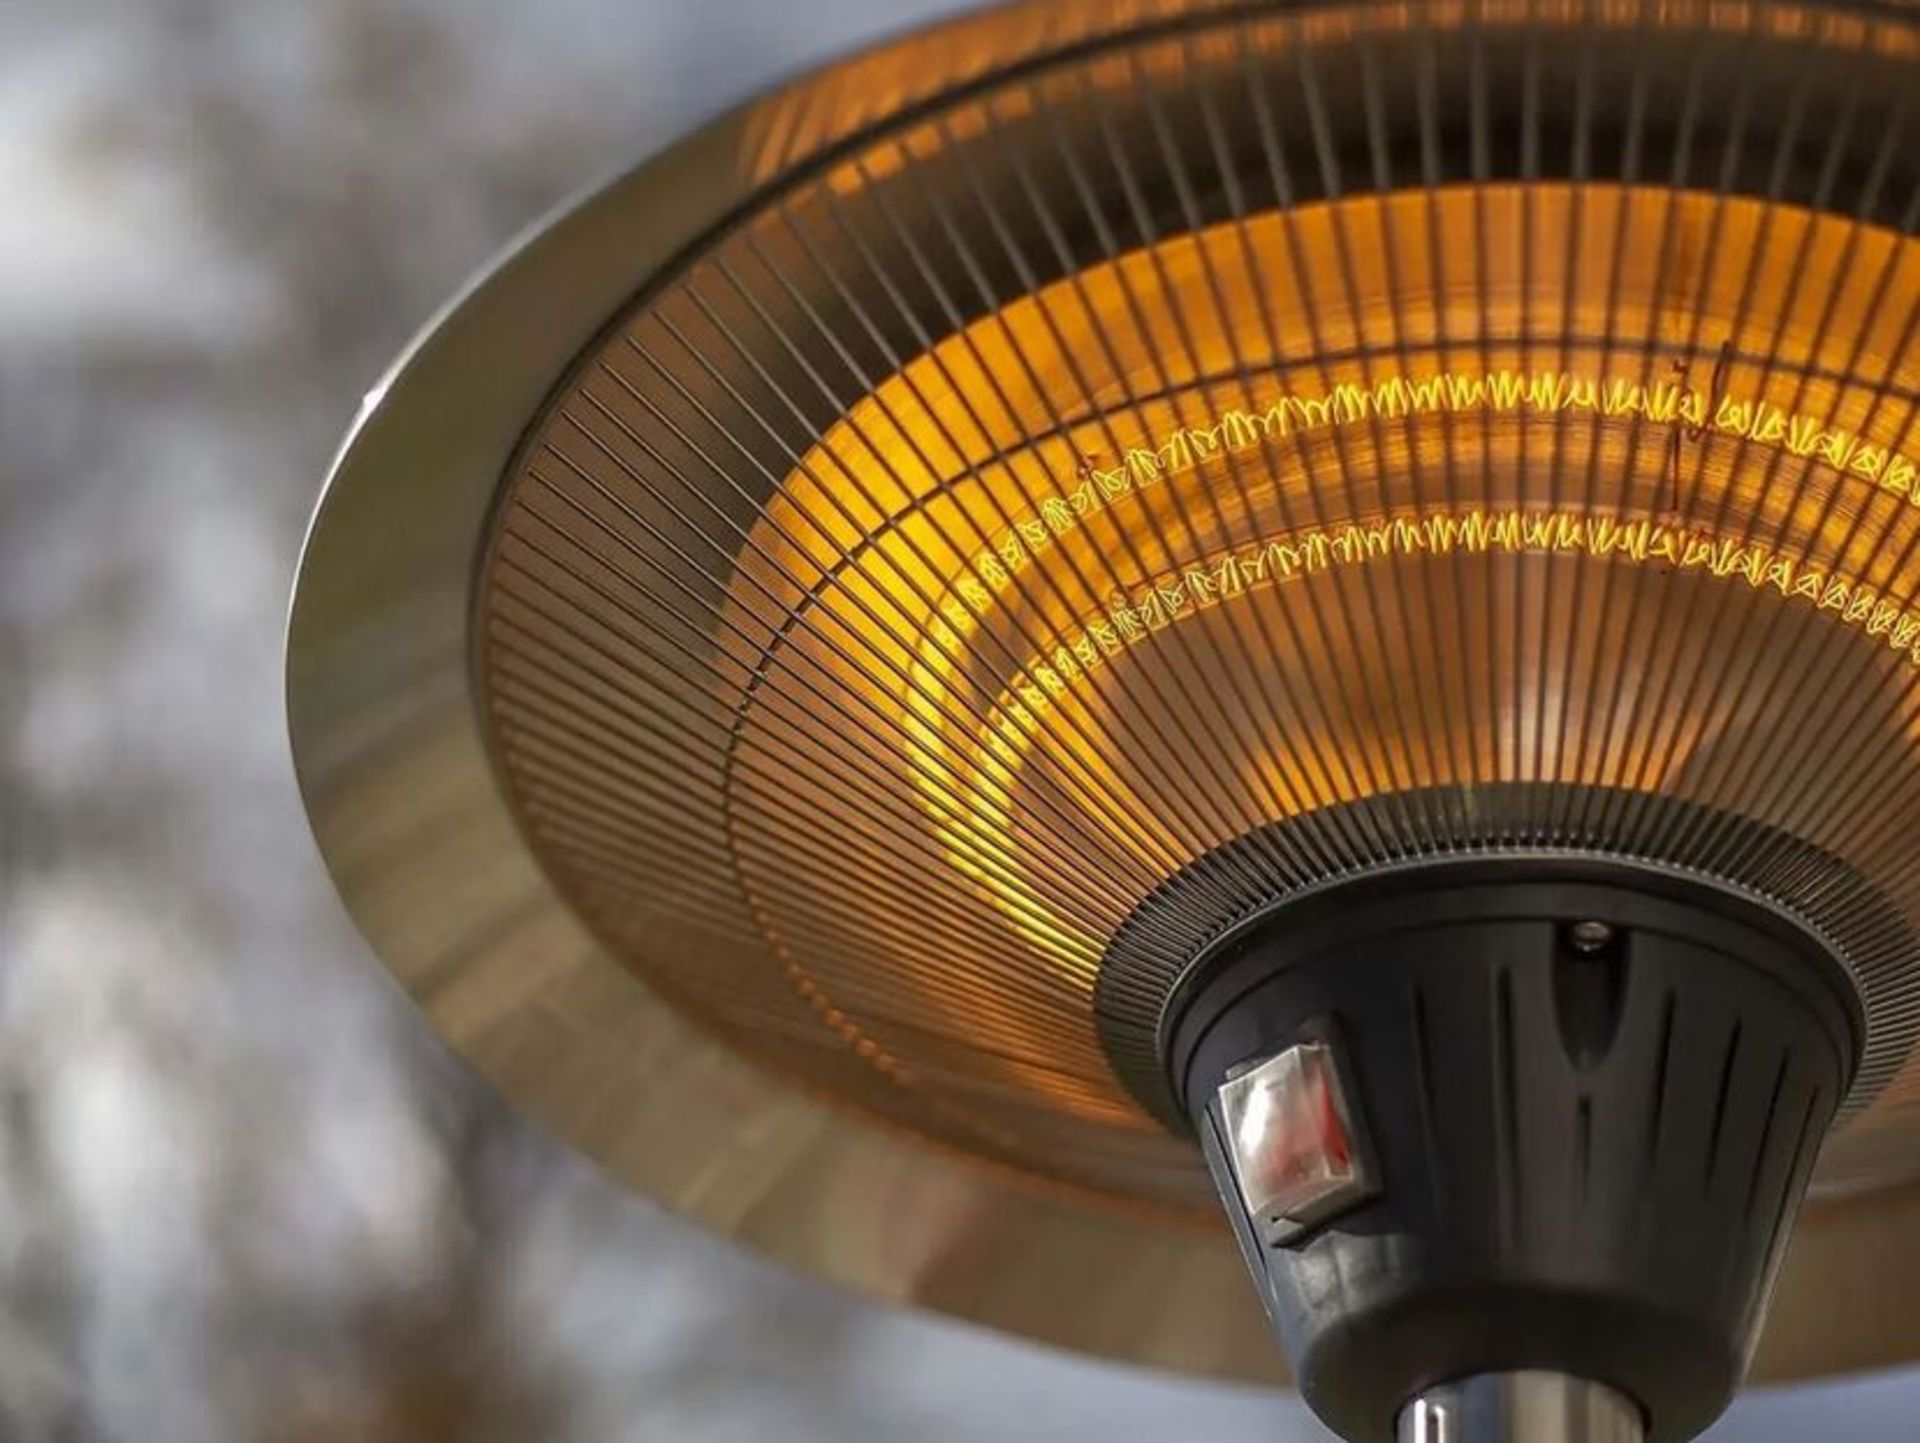 (P7) 1x La Hacienda Lume Standing Heater RRP £99.99 3 Heater Settings: 900W, 1200W & 2100W (H205x - Image 2 of 4